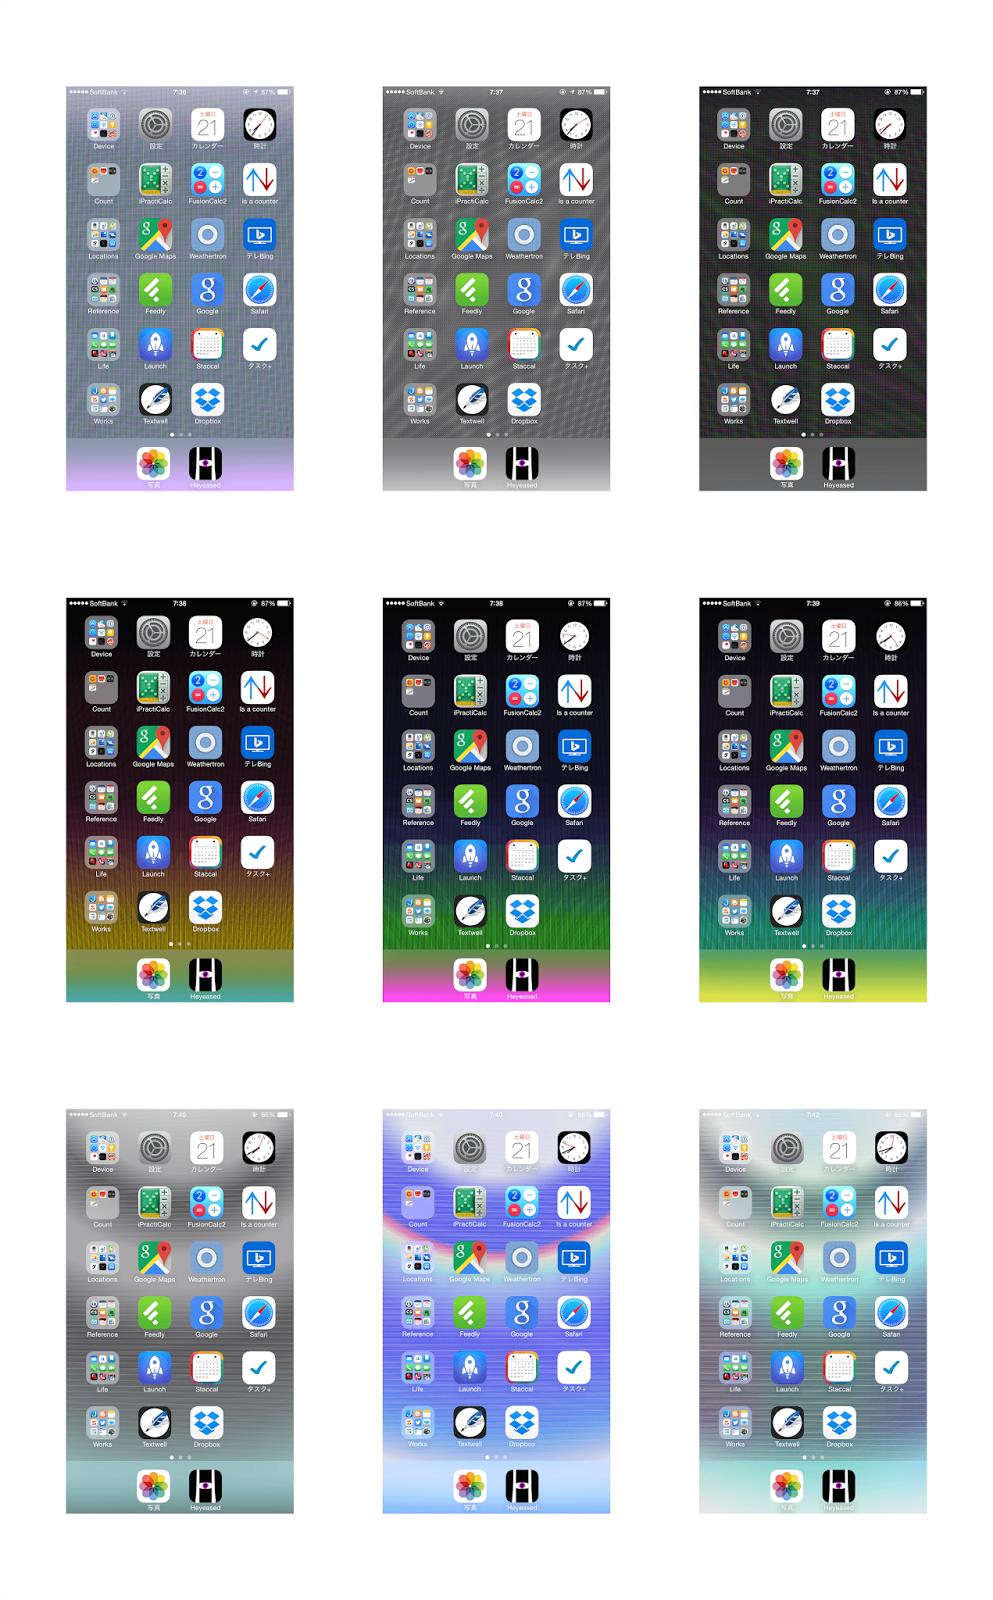 Iphoneを脱獄しなくても動く水 火 空のダイナミック静止画壁紙追加